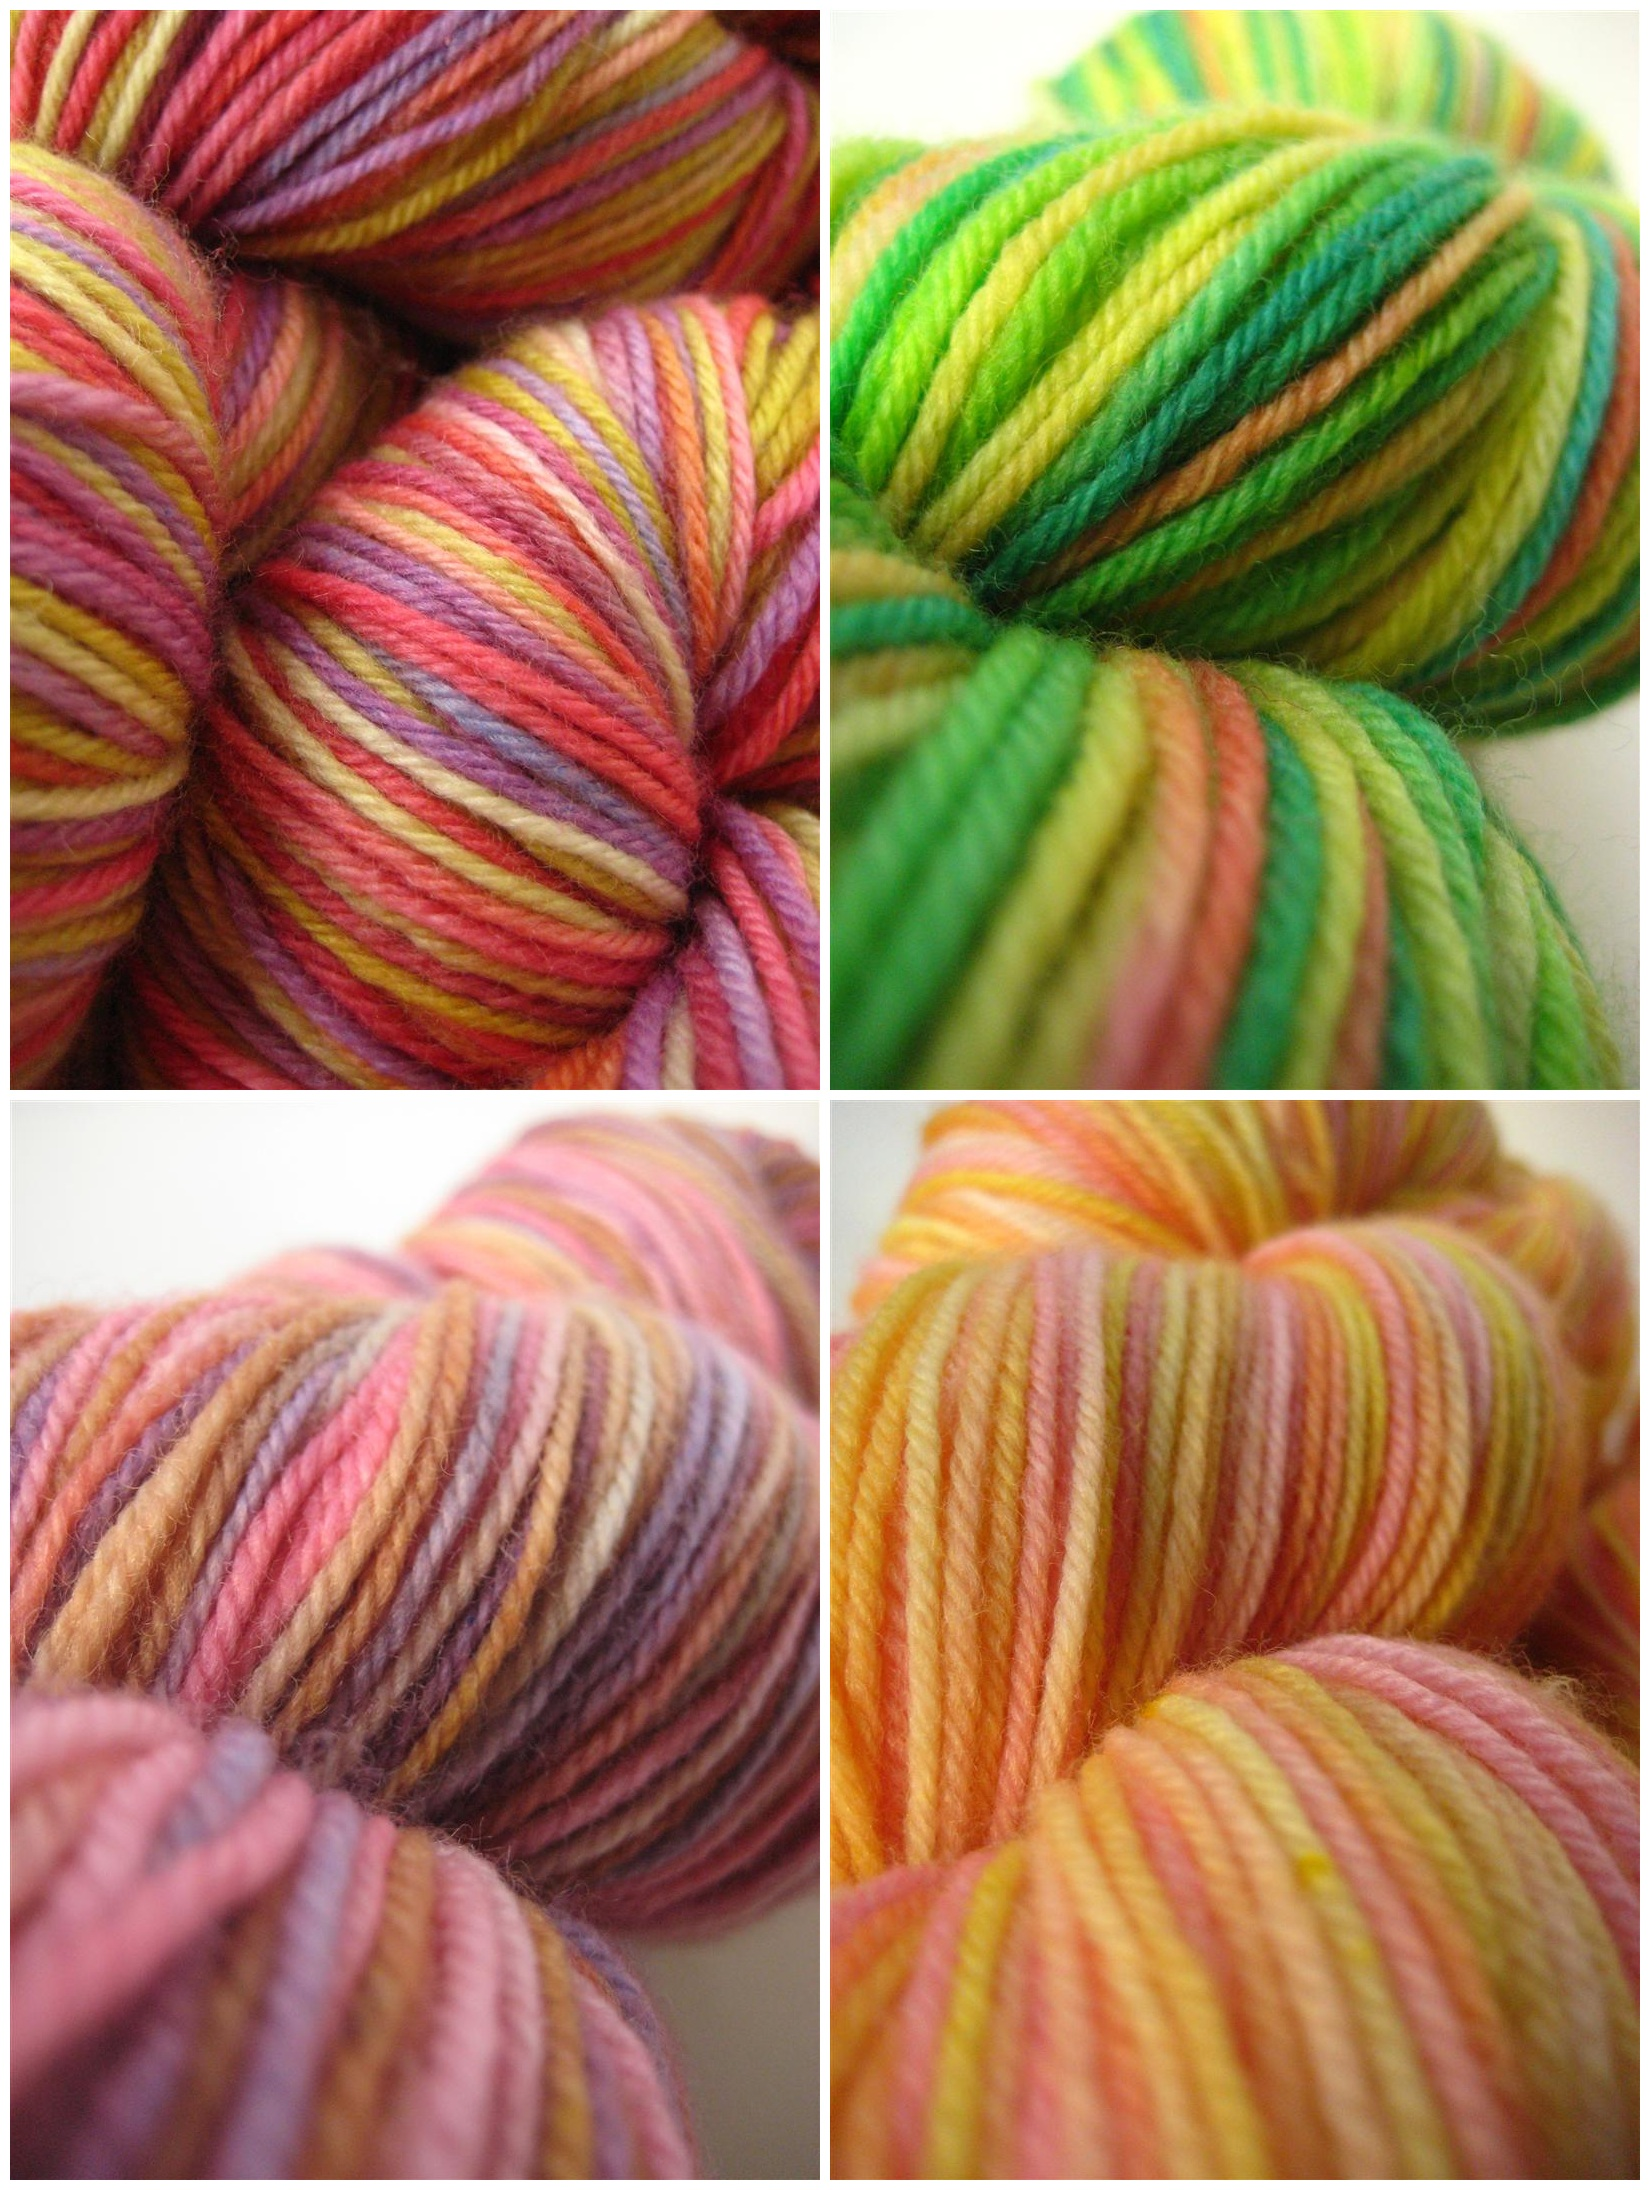 yarn, sock yarn, knitting, crochet, hand-dyed, hand dyed, handdyed